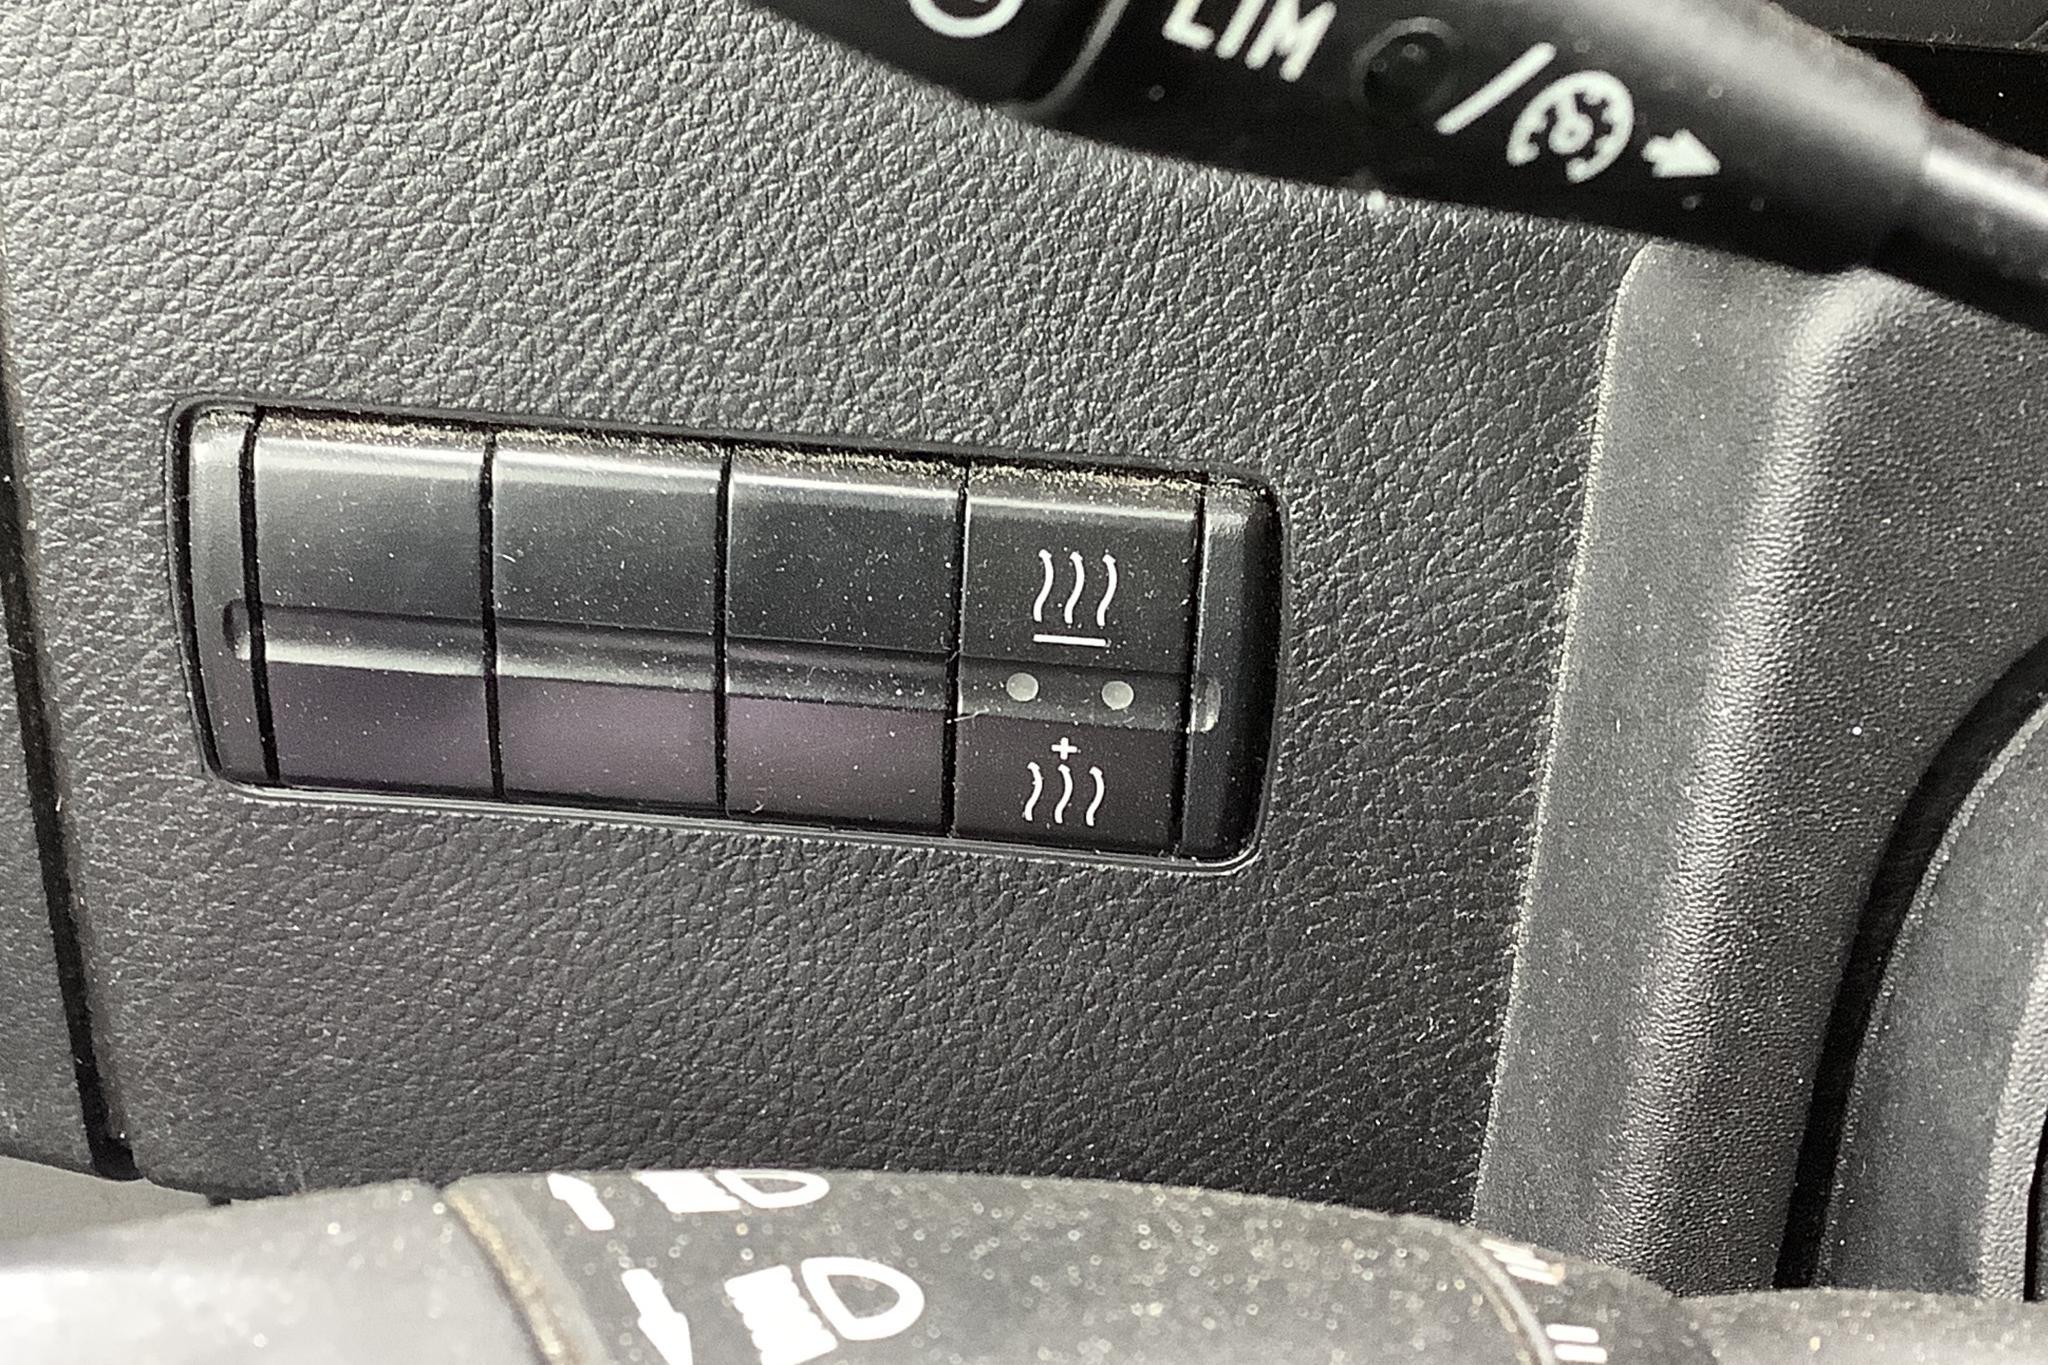 Mercedes Sprinter 316 CDI (163hk) - 535 260 km - Automatic - white - 2013